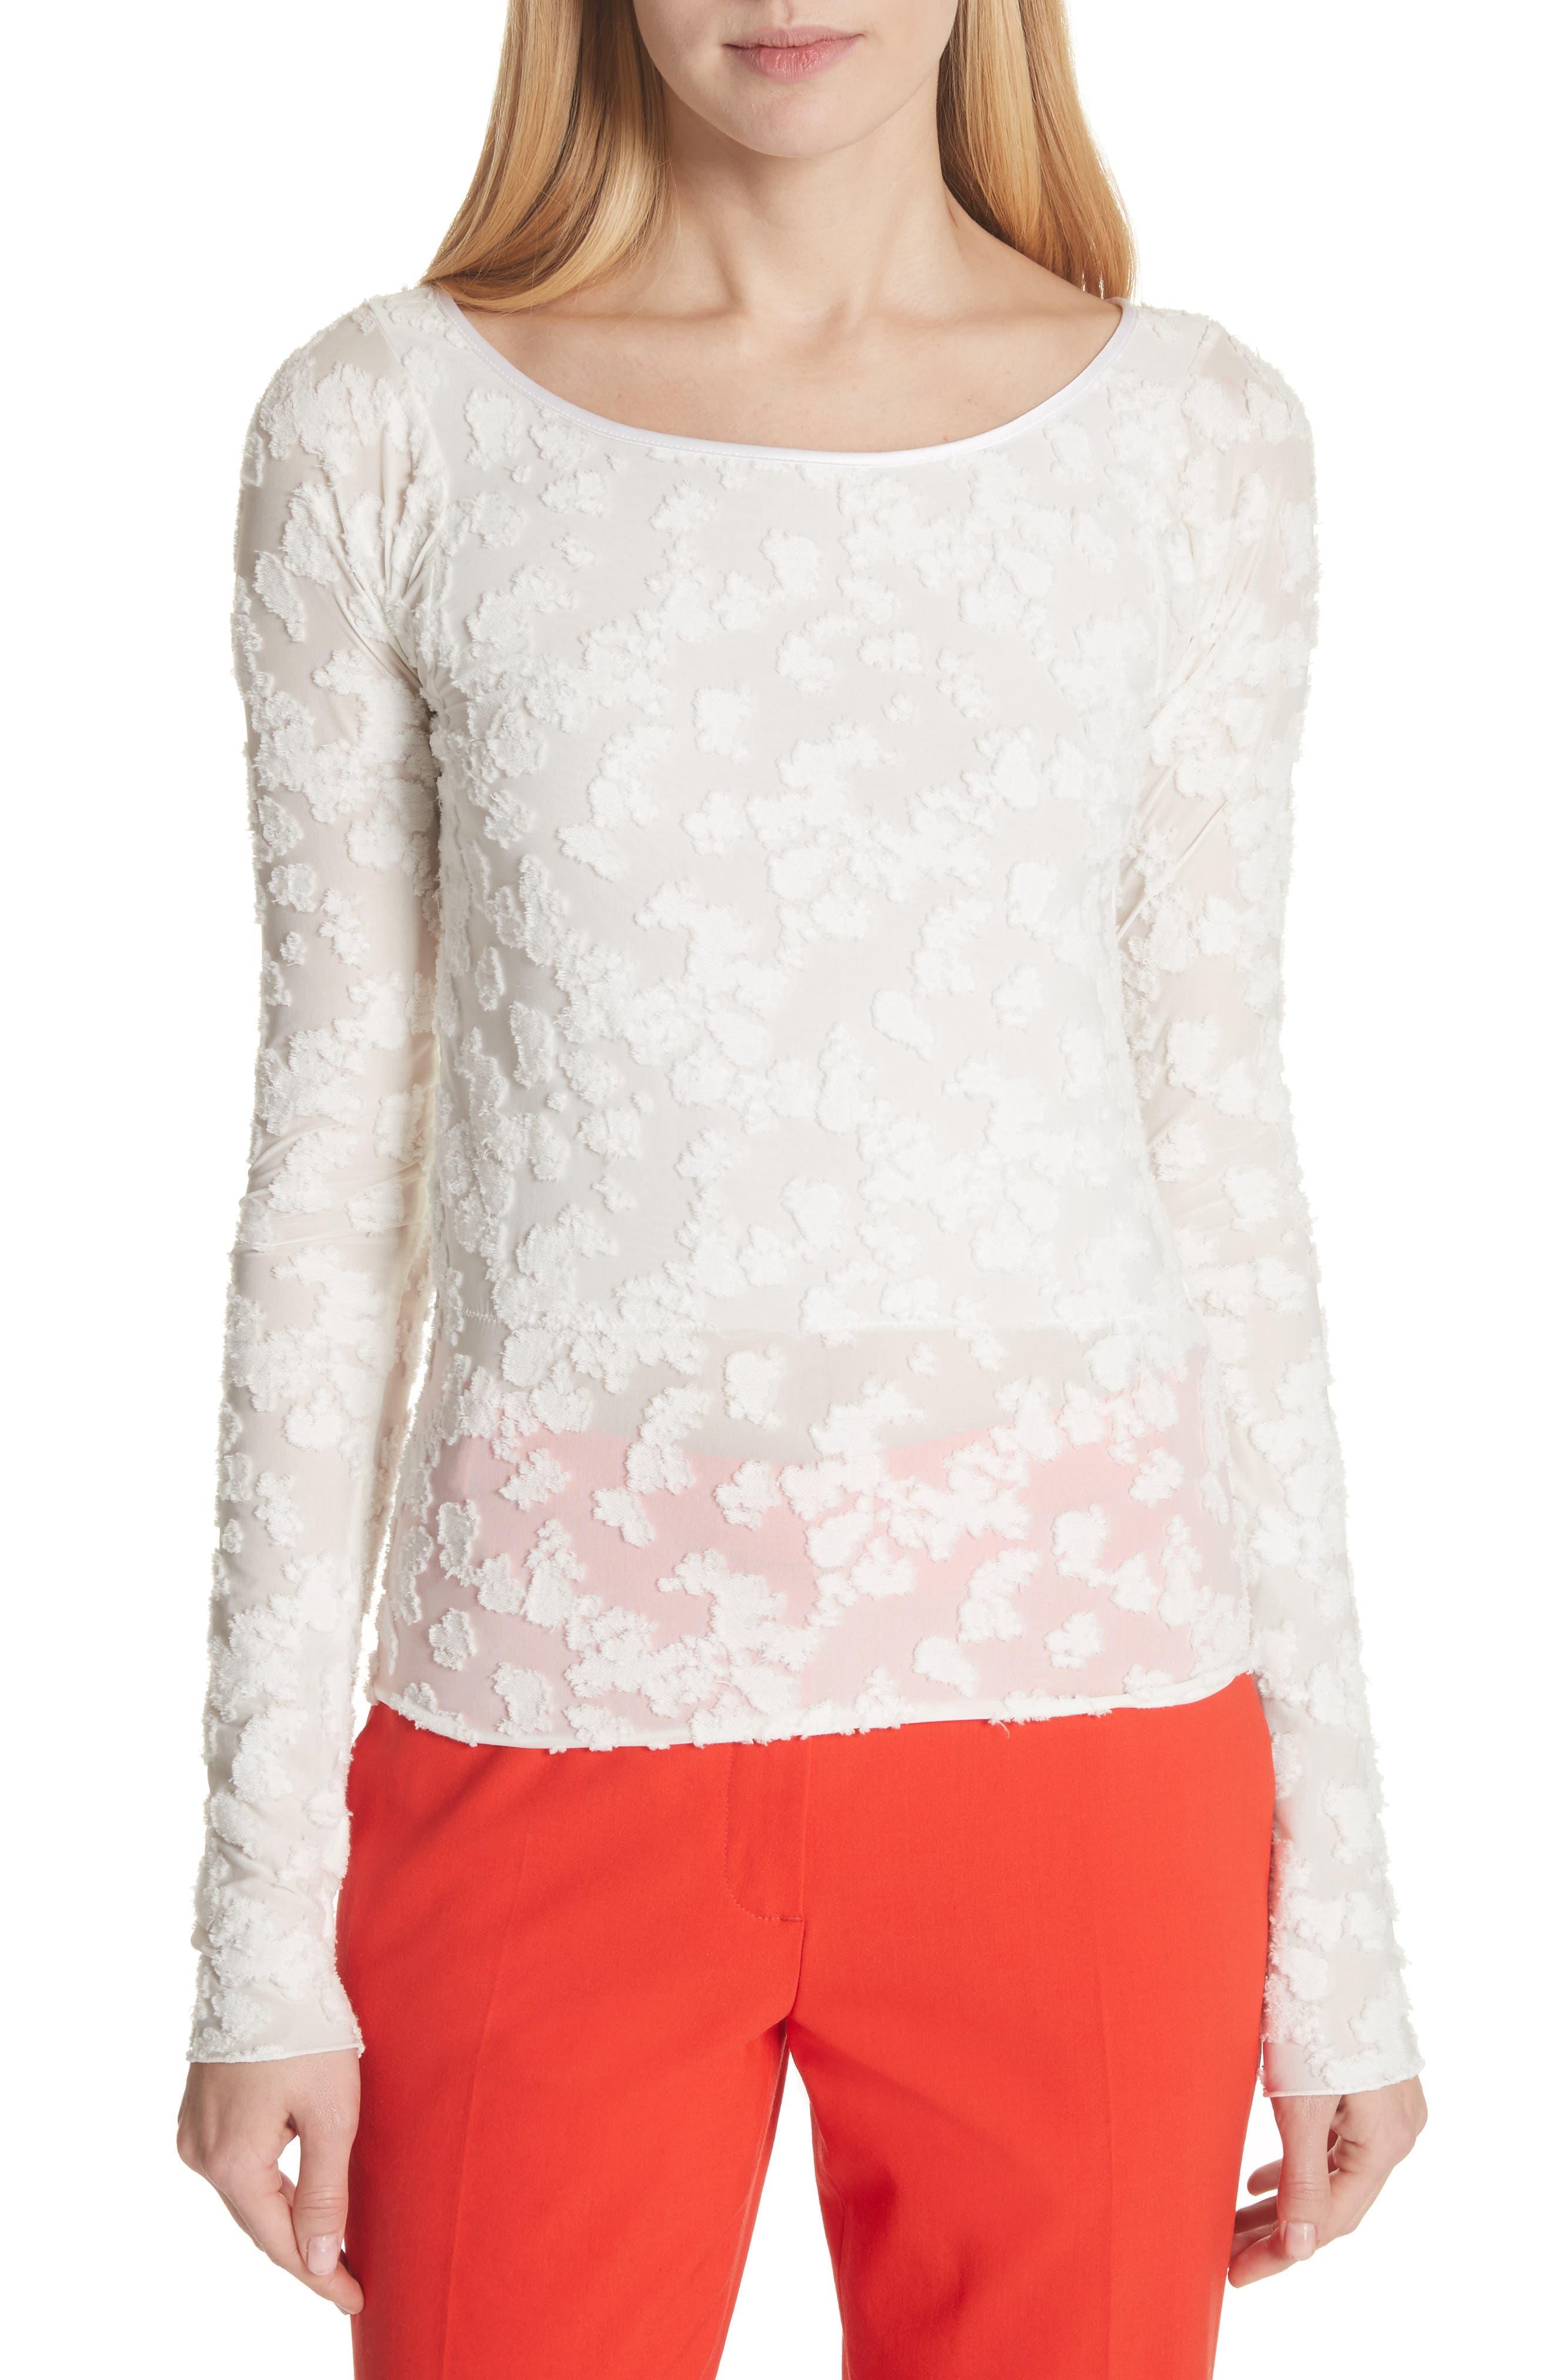 Alternate Image 1 Selected - rag & bone Lucie Floral Jacquard Sweater